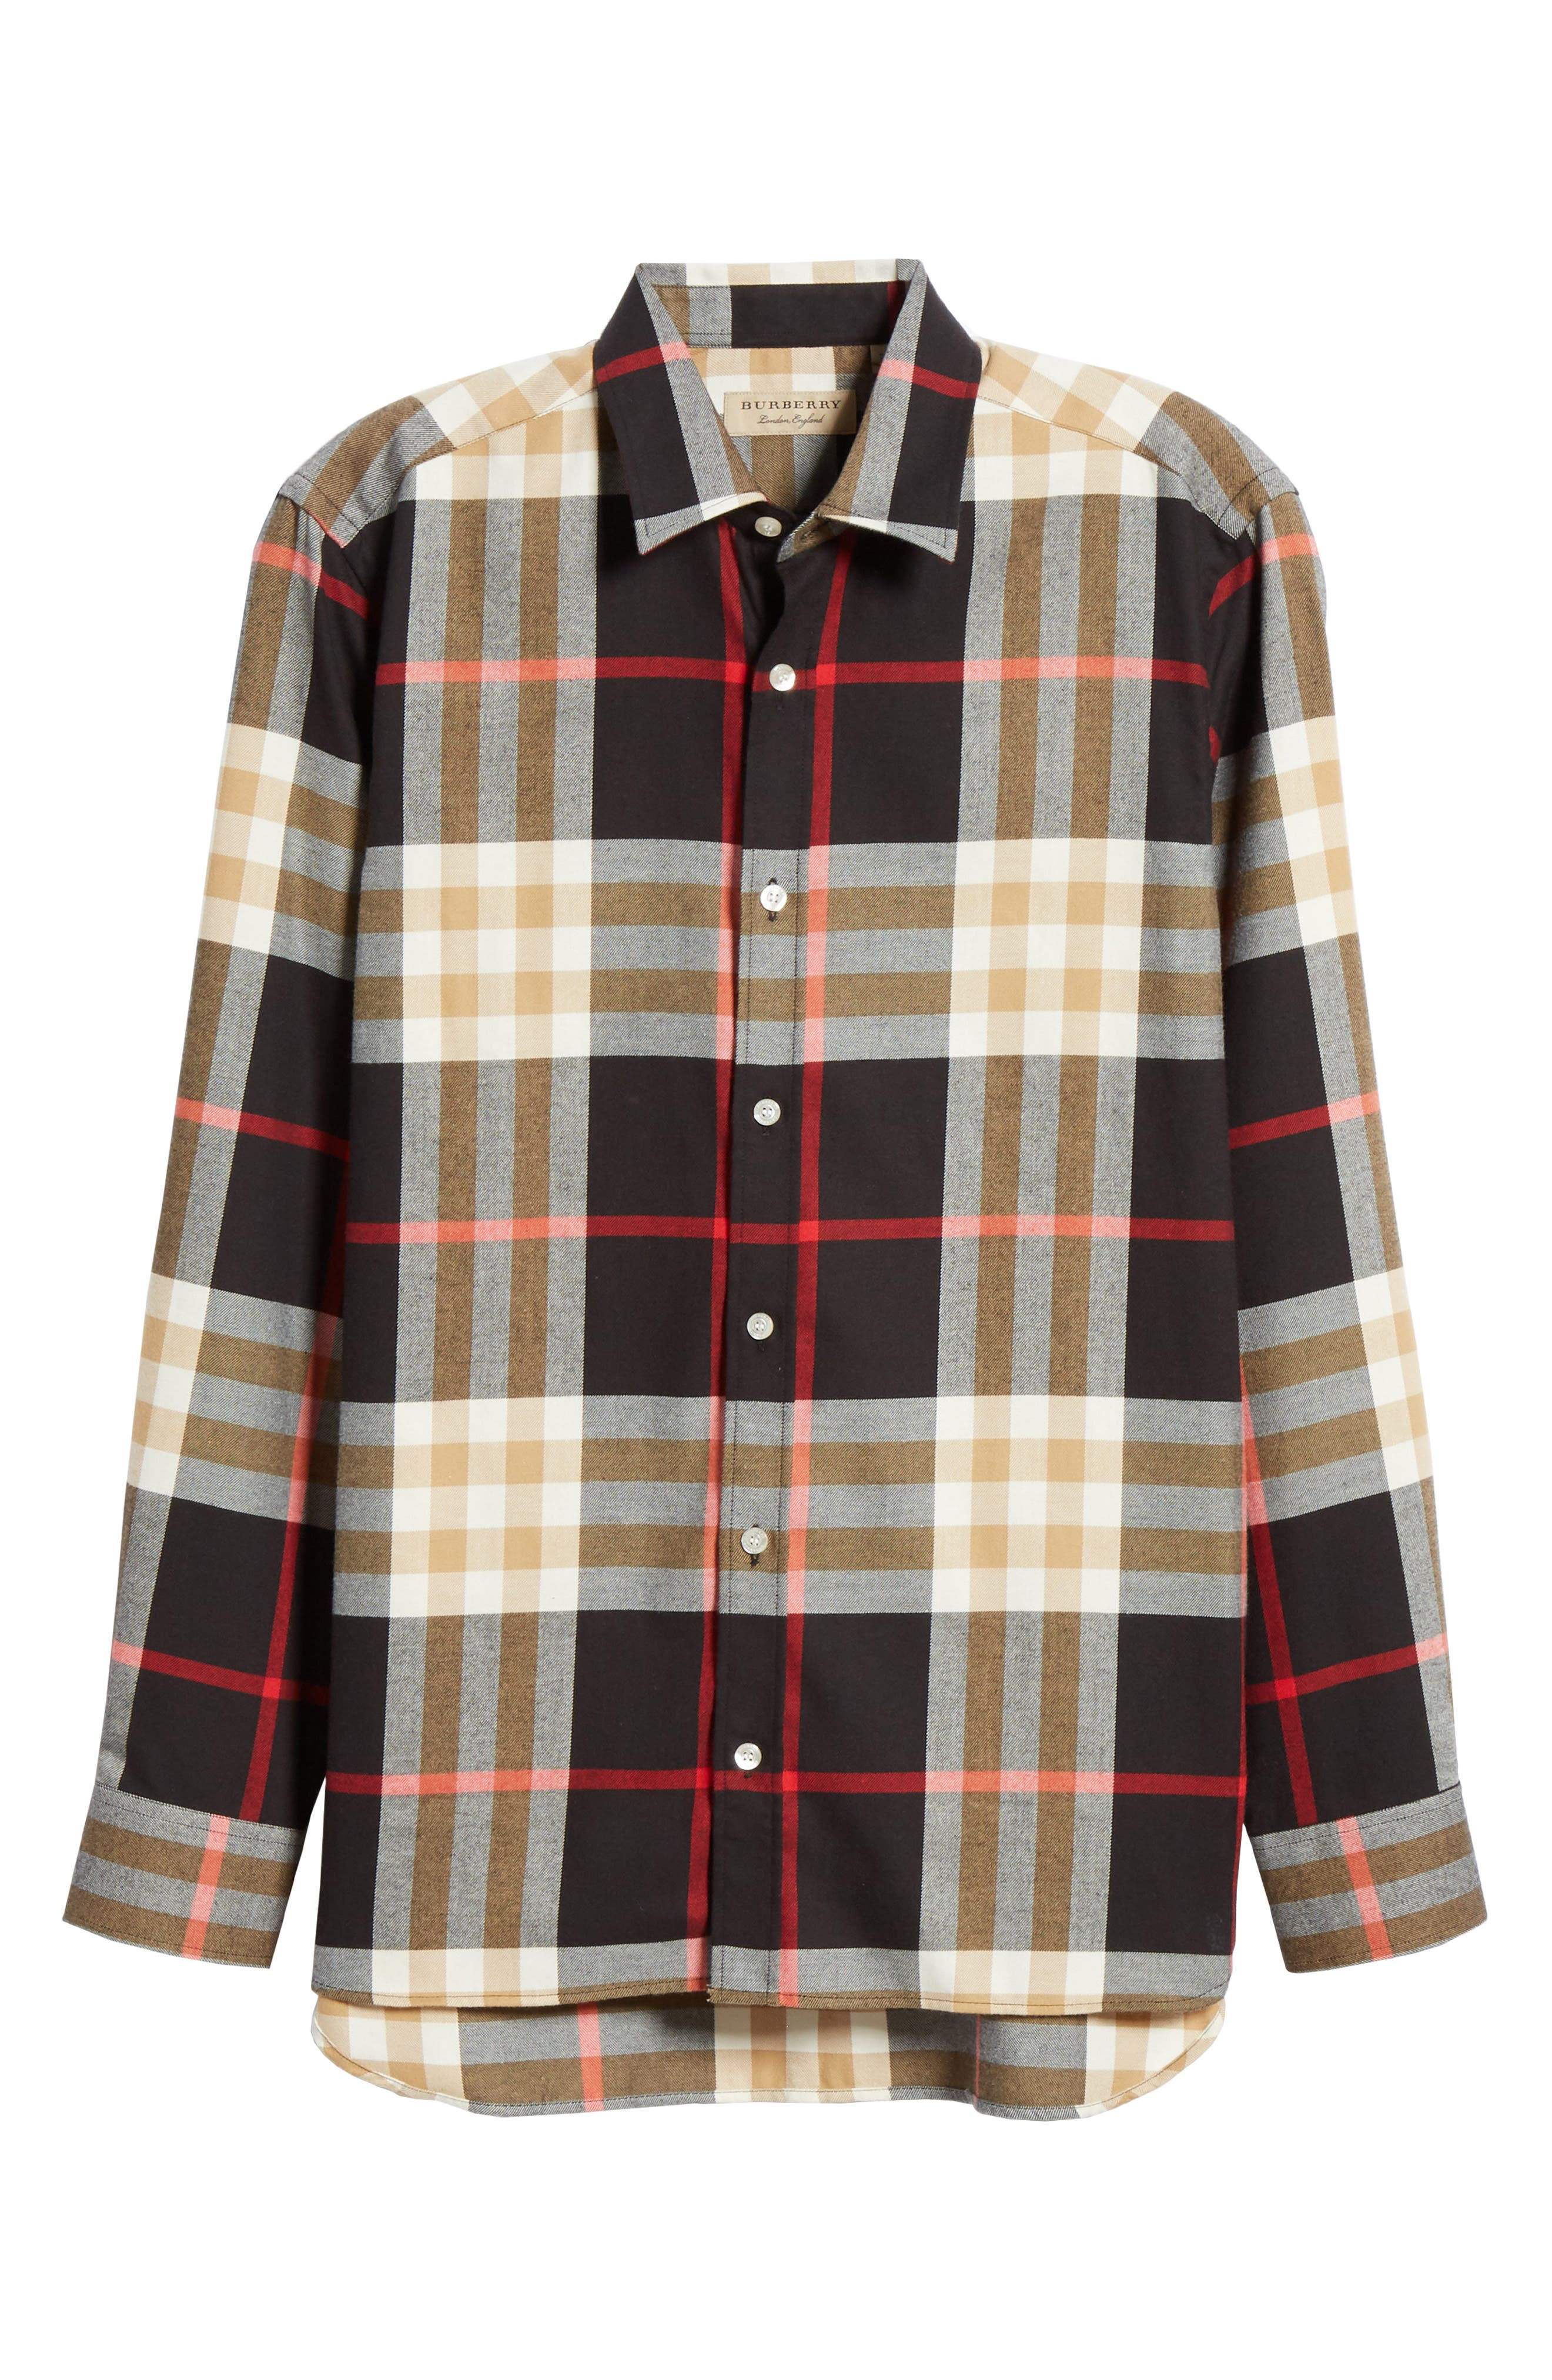 BURBERRY, Richard Slim Fit Plaid Sport Shirt, Alternate thumbnail 5, color, BLACK CHECK